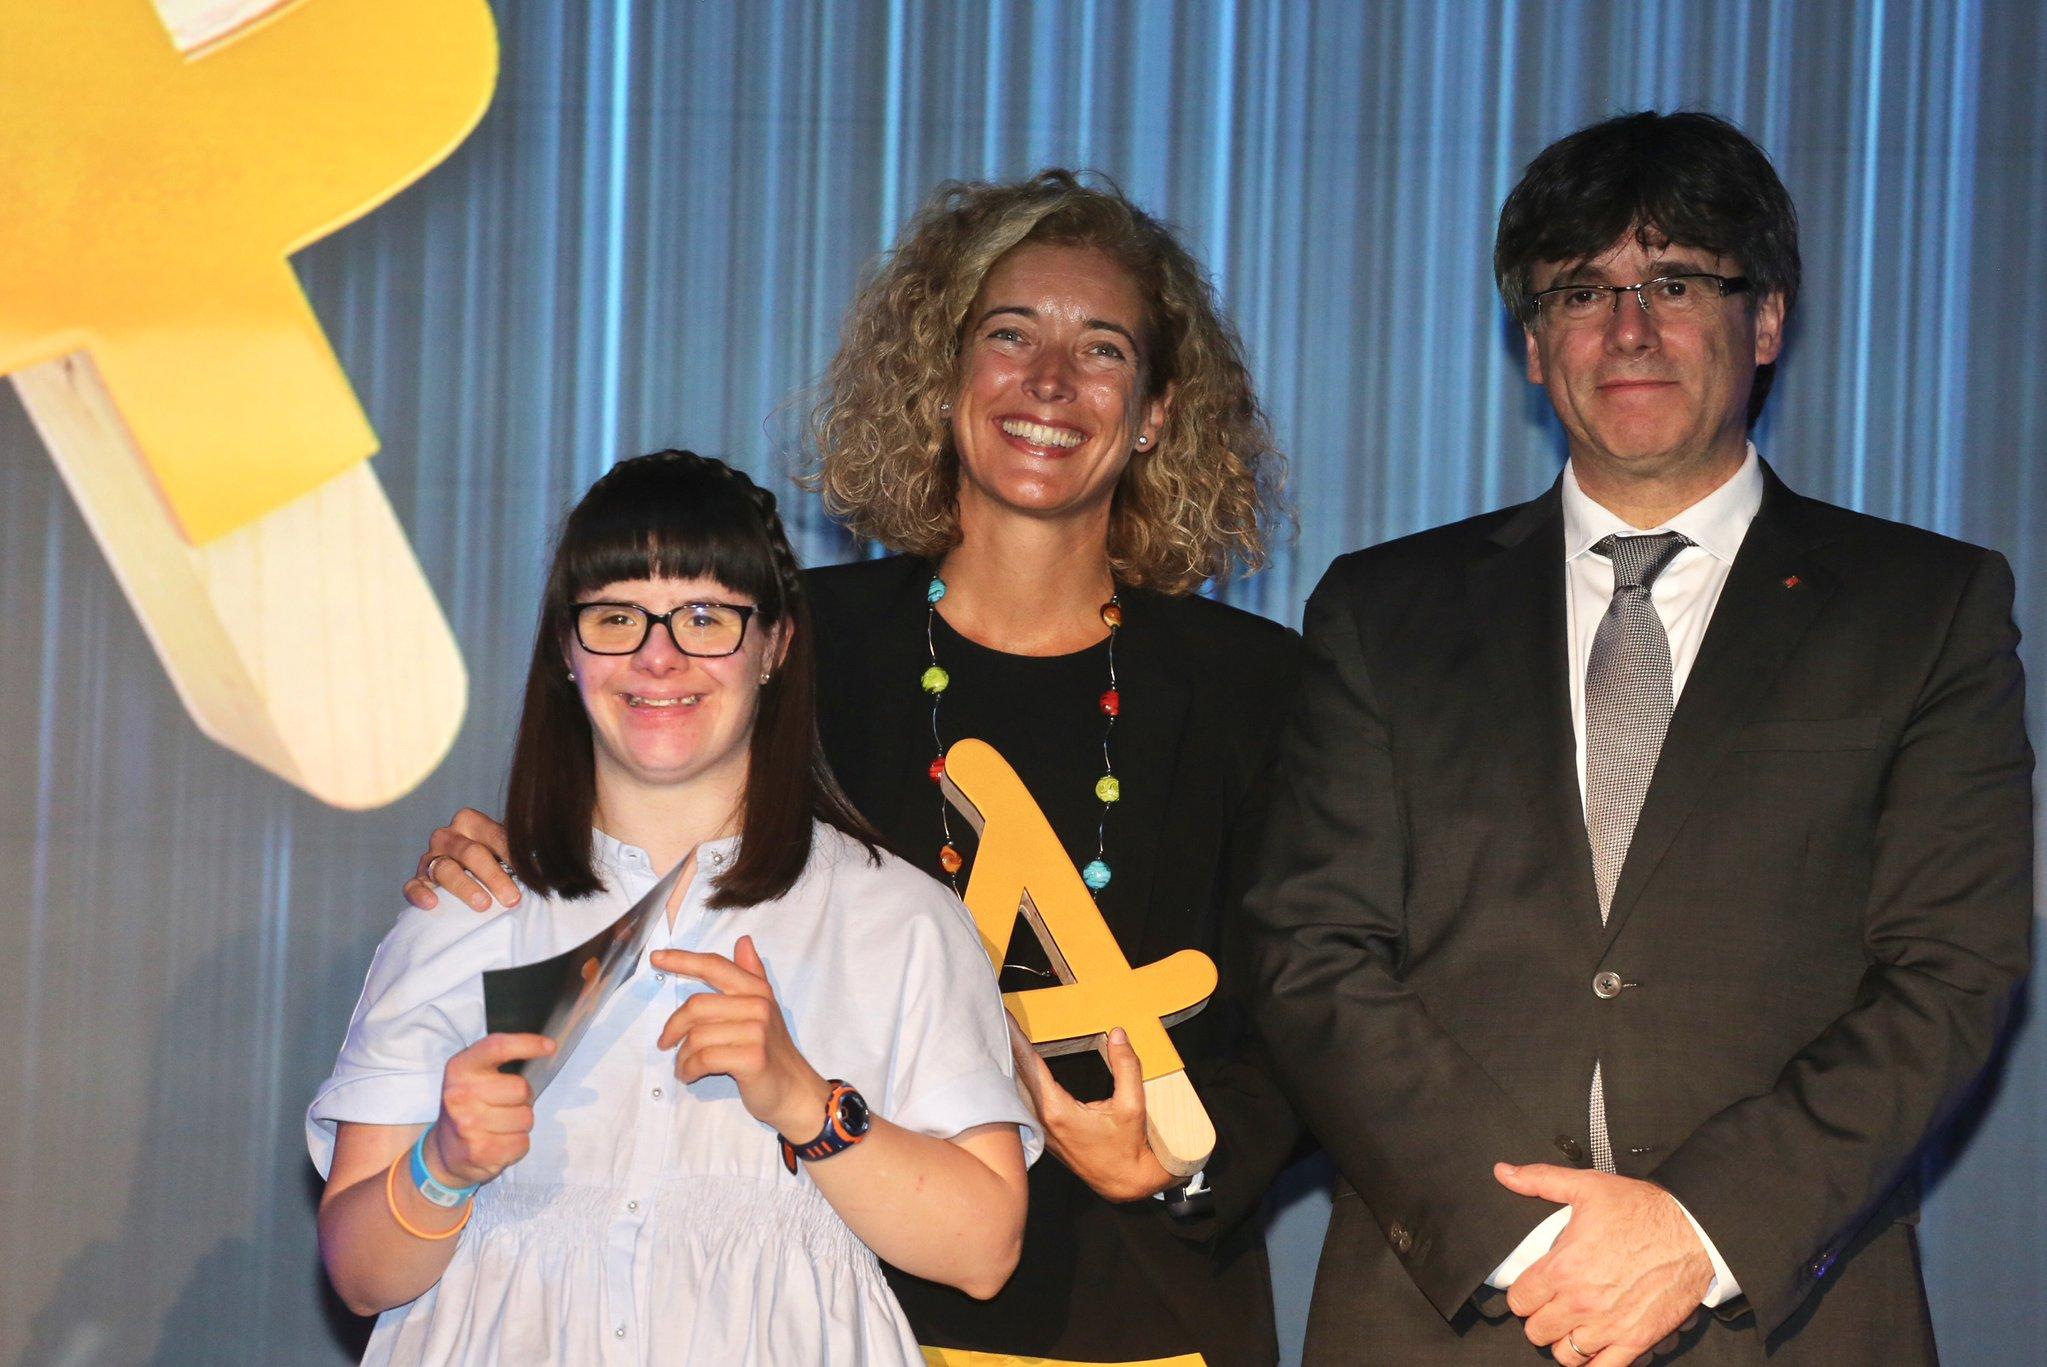 Premio Anna Vives TeloReciclo